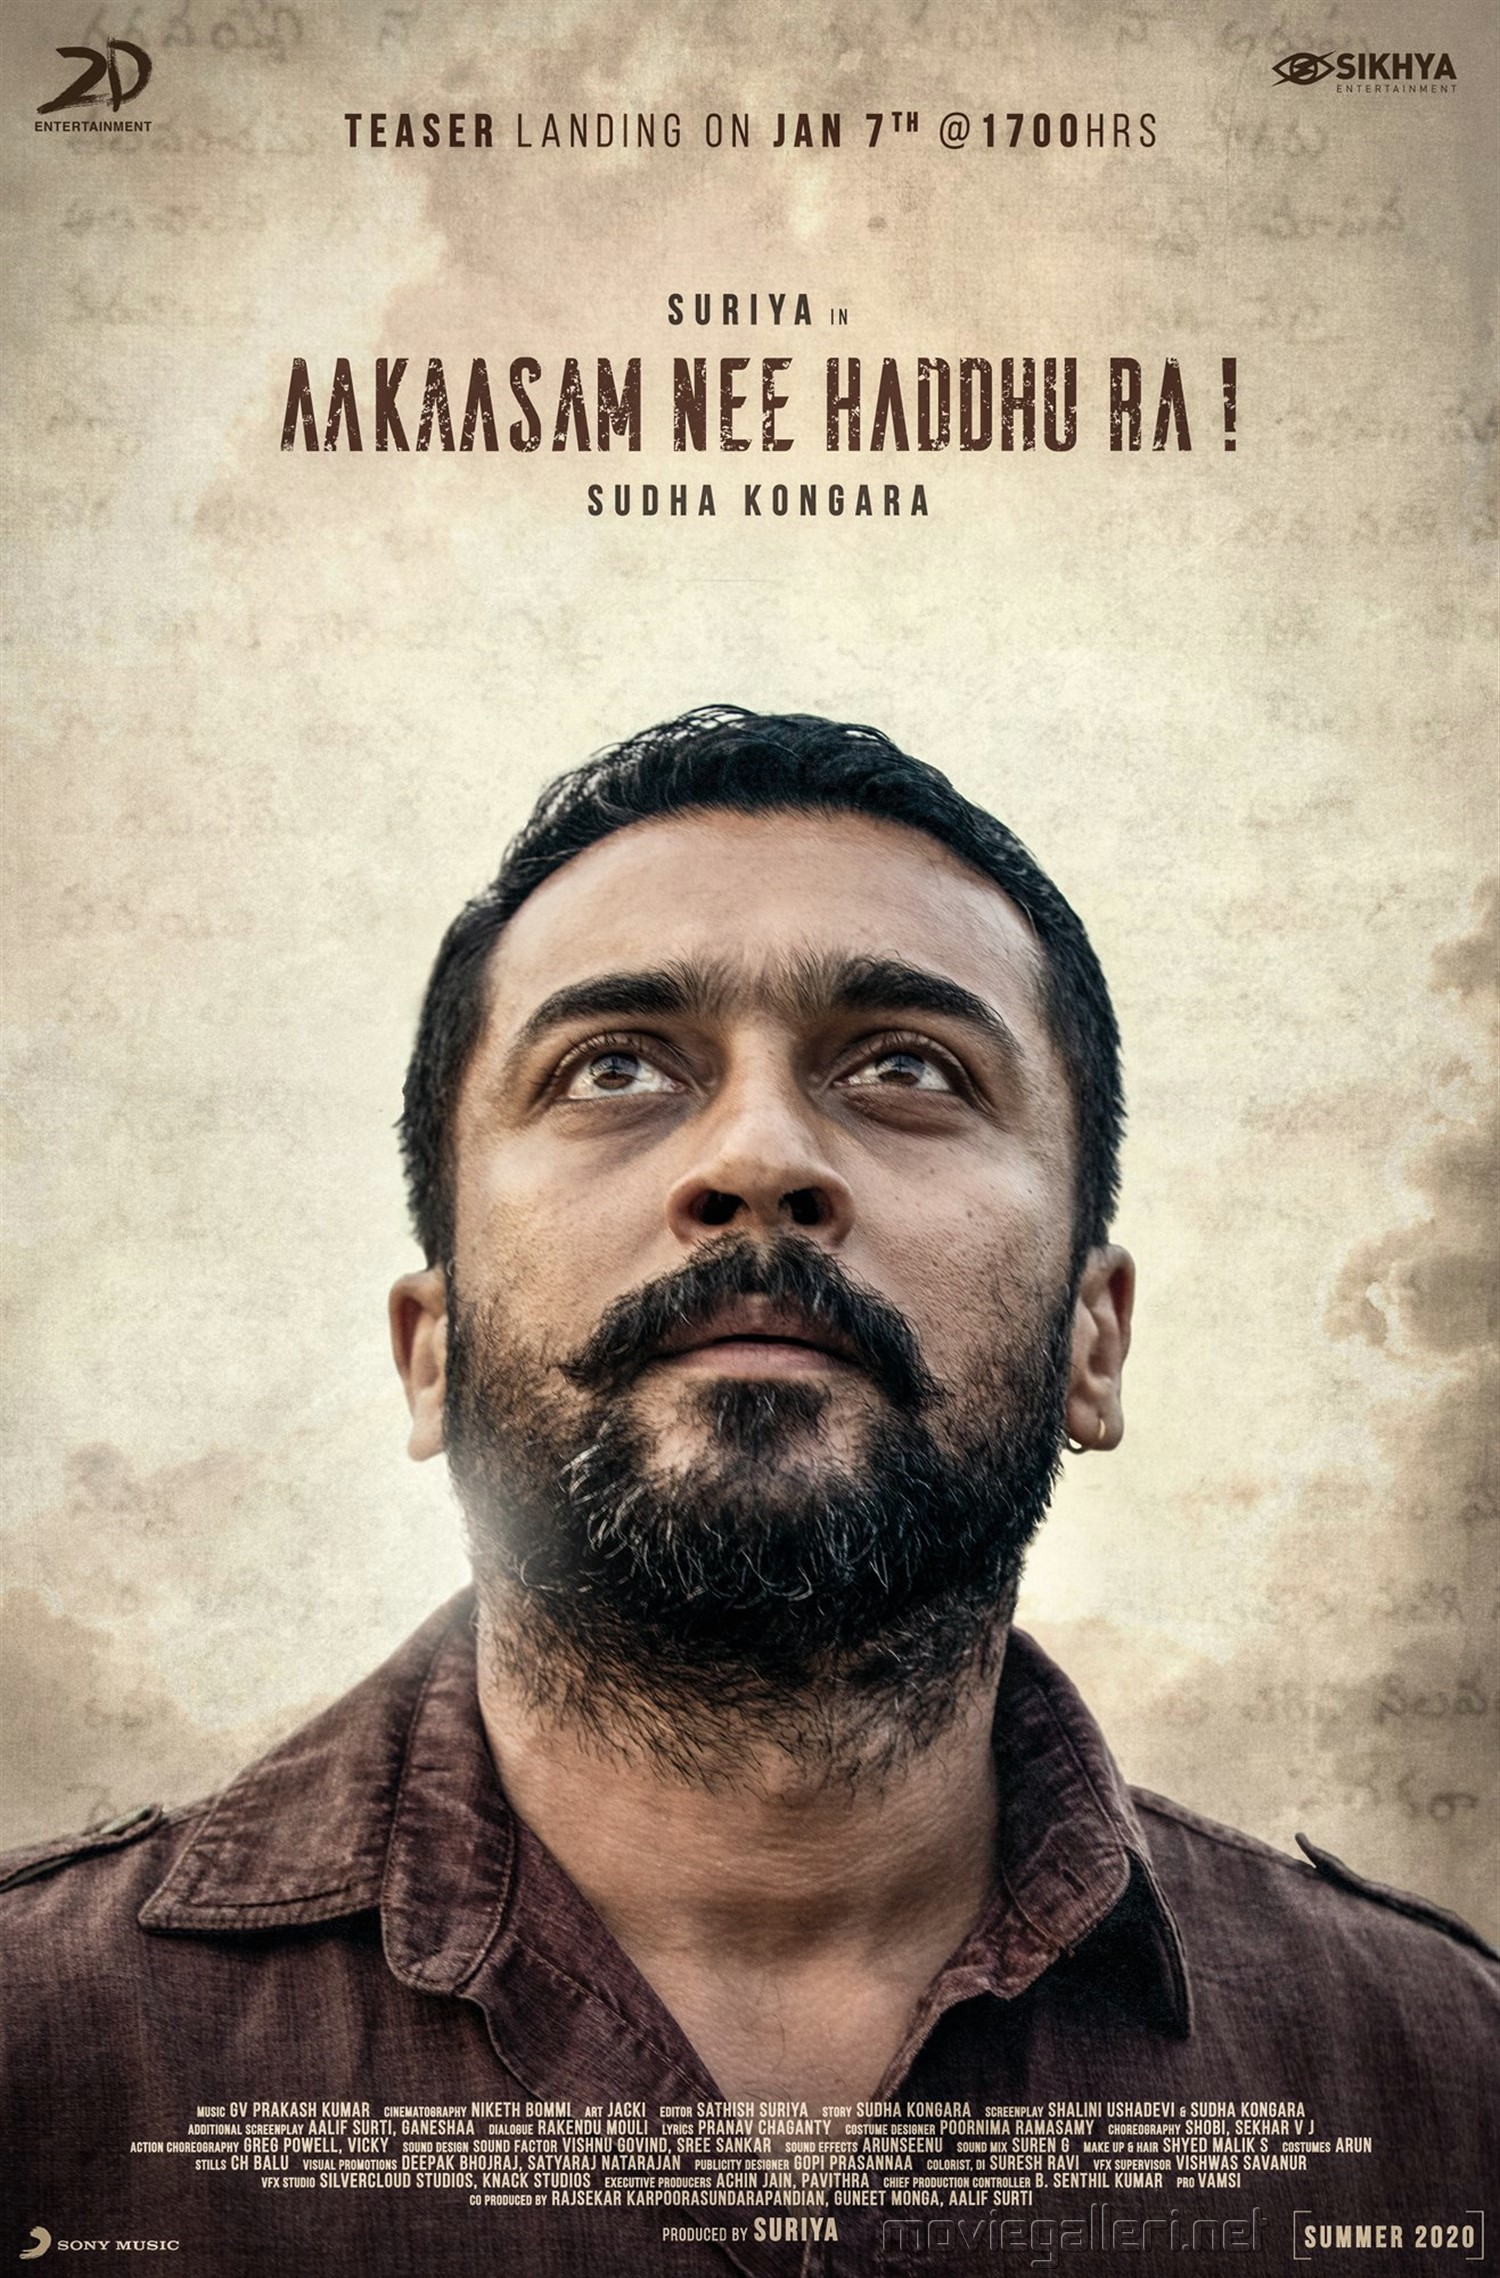 Suriya Aakaasam Nee Haddhu Ra Movie Teaser Release Jan 7th Poster HD